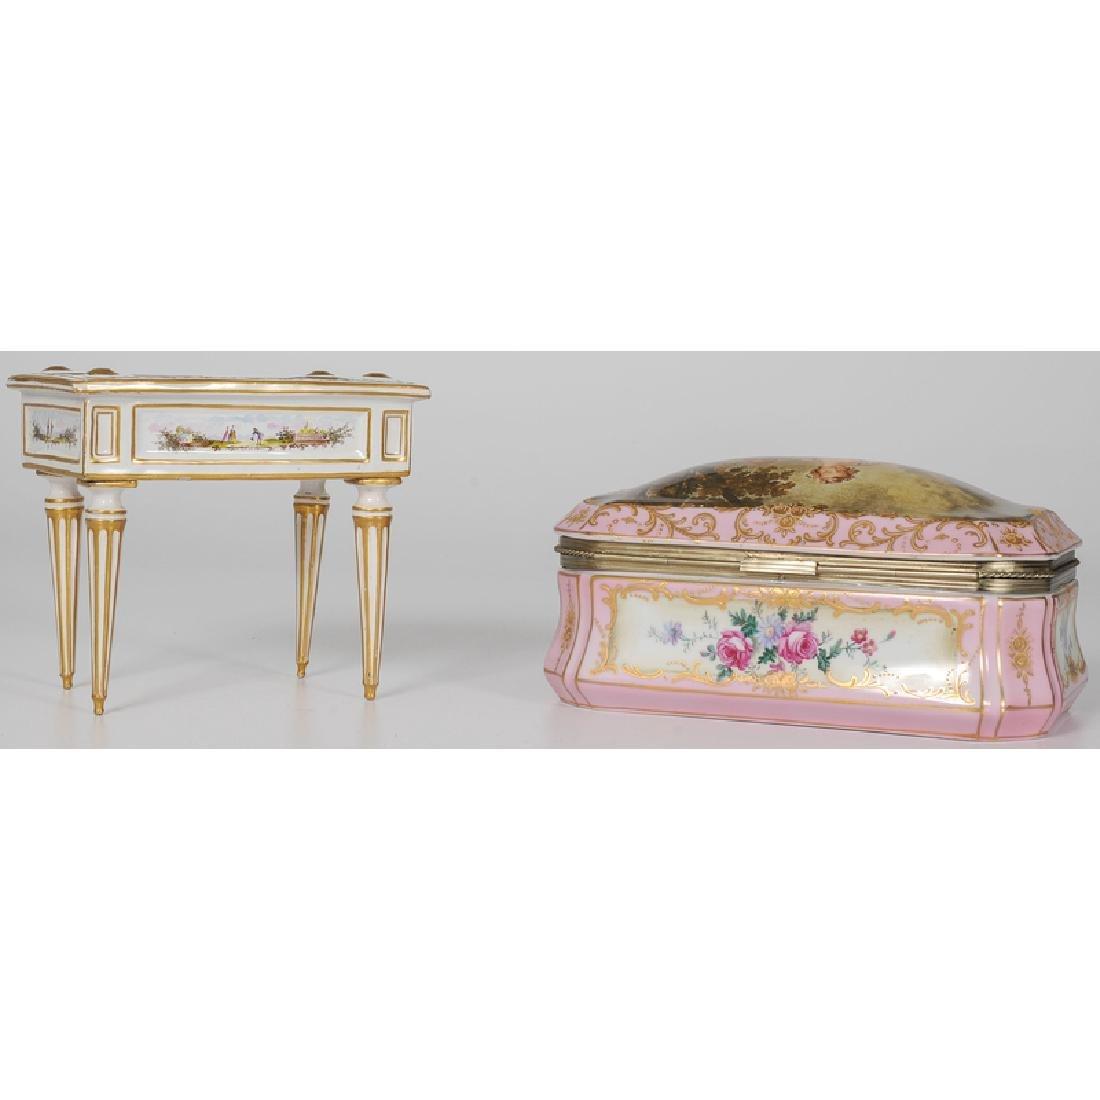 Marseilles Faience Diminutive Desk and Porcelain - 3